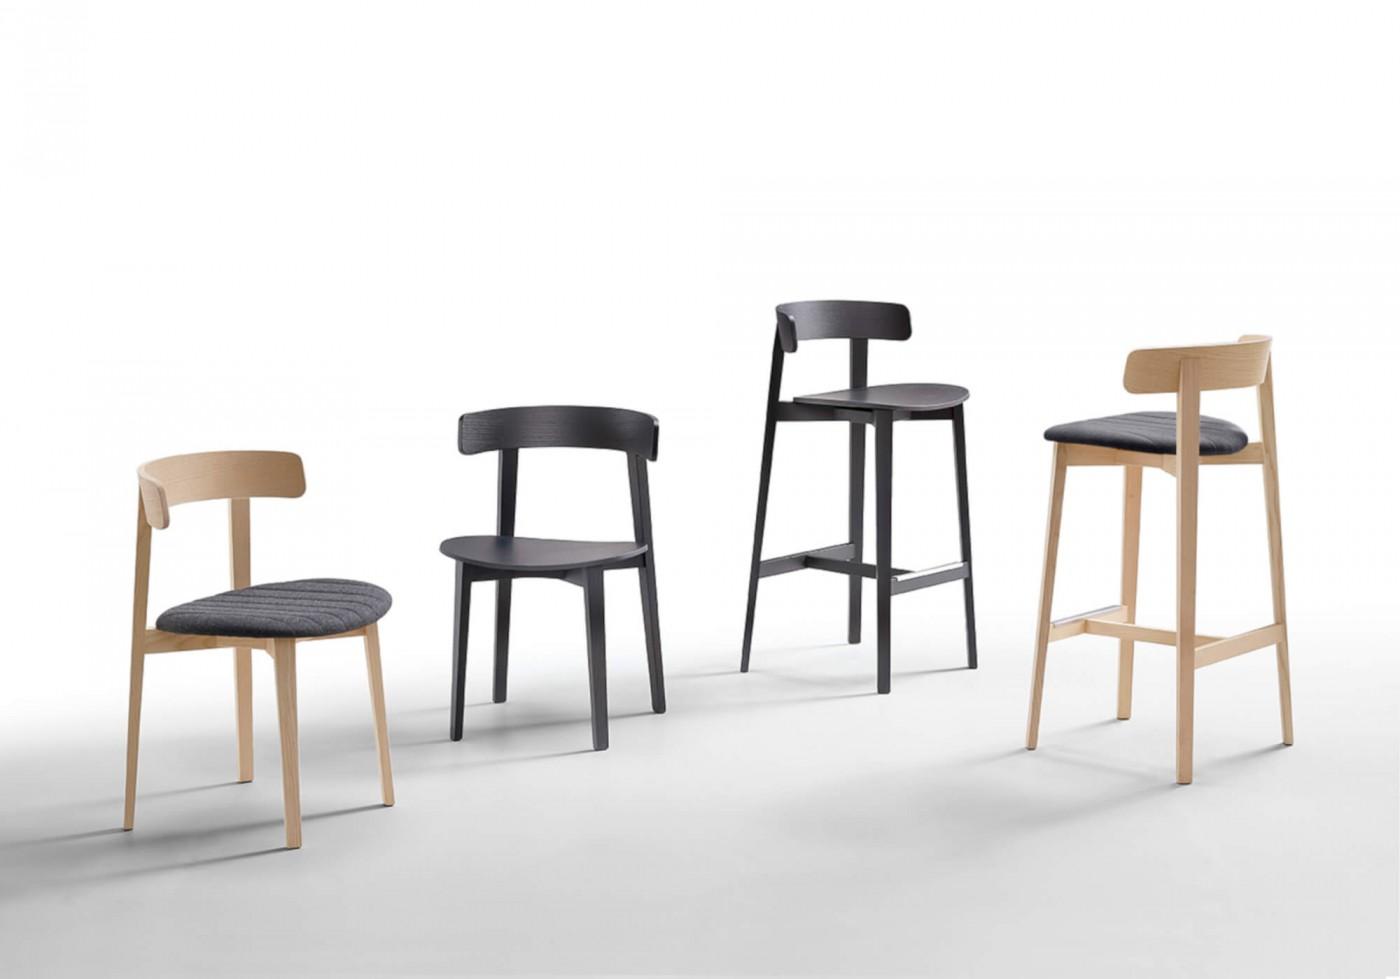 Sedie Alte Da Bar Design maya s l ts chair   midj in italy